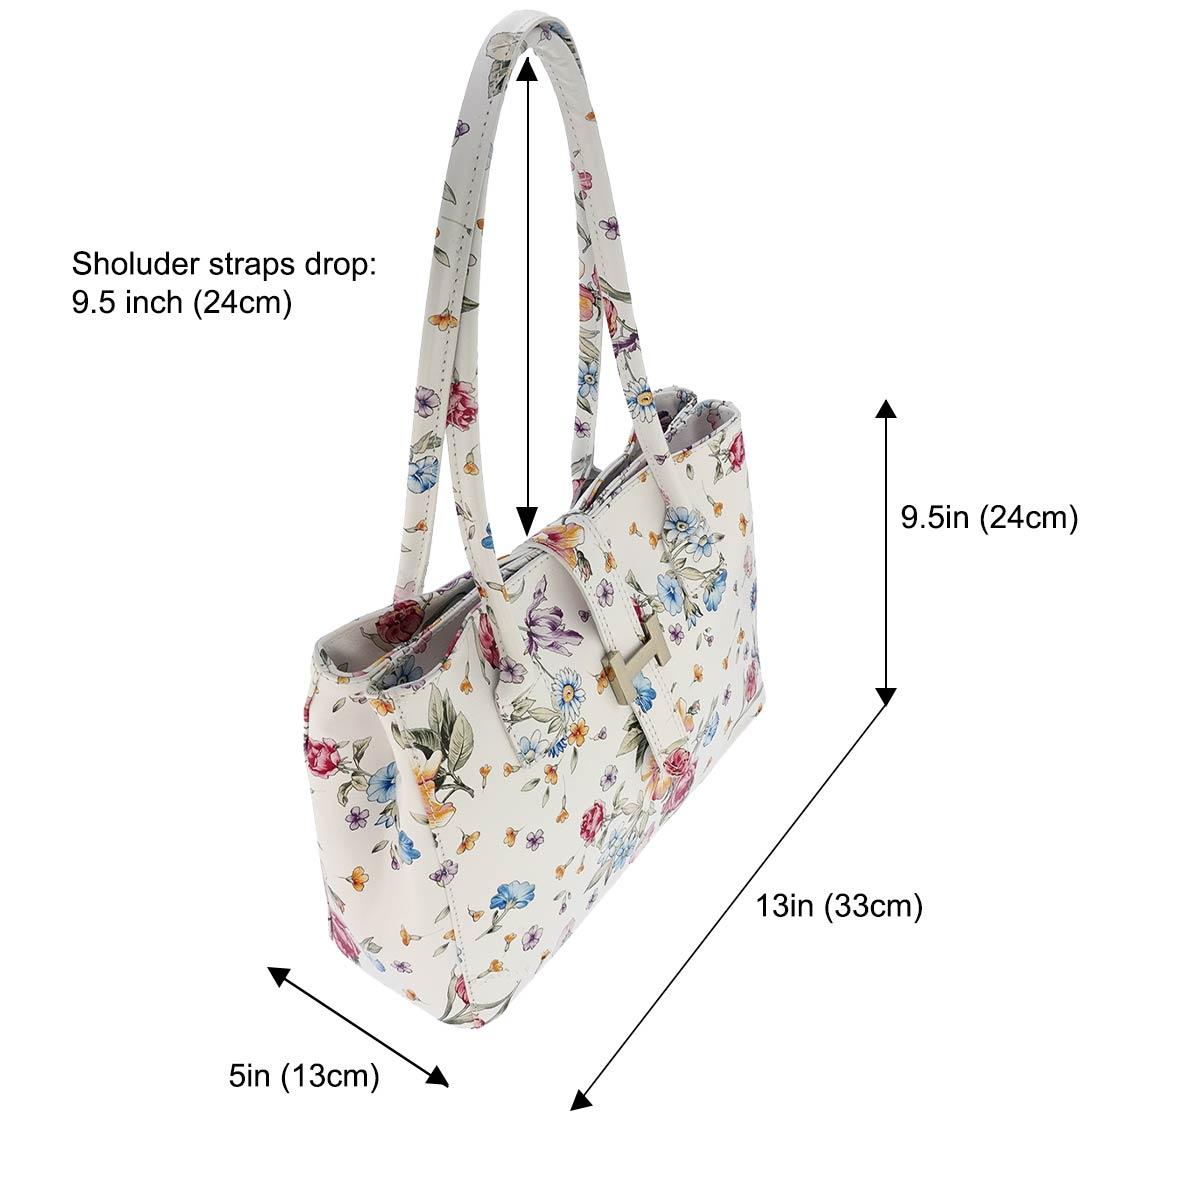 Fioretta Italian Genuine Leather Shoulder Bag Tote Handbag For Women